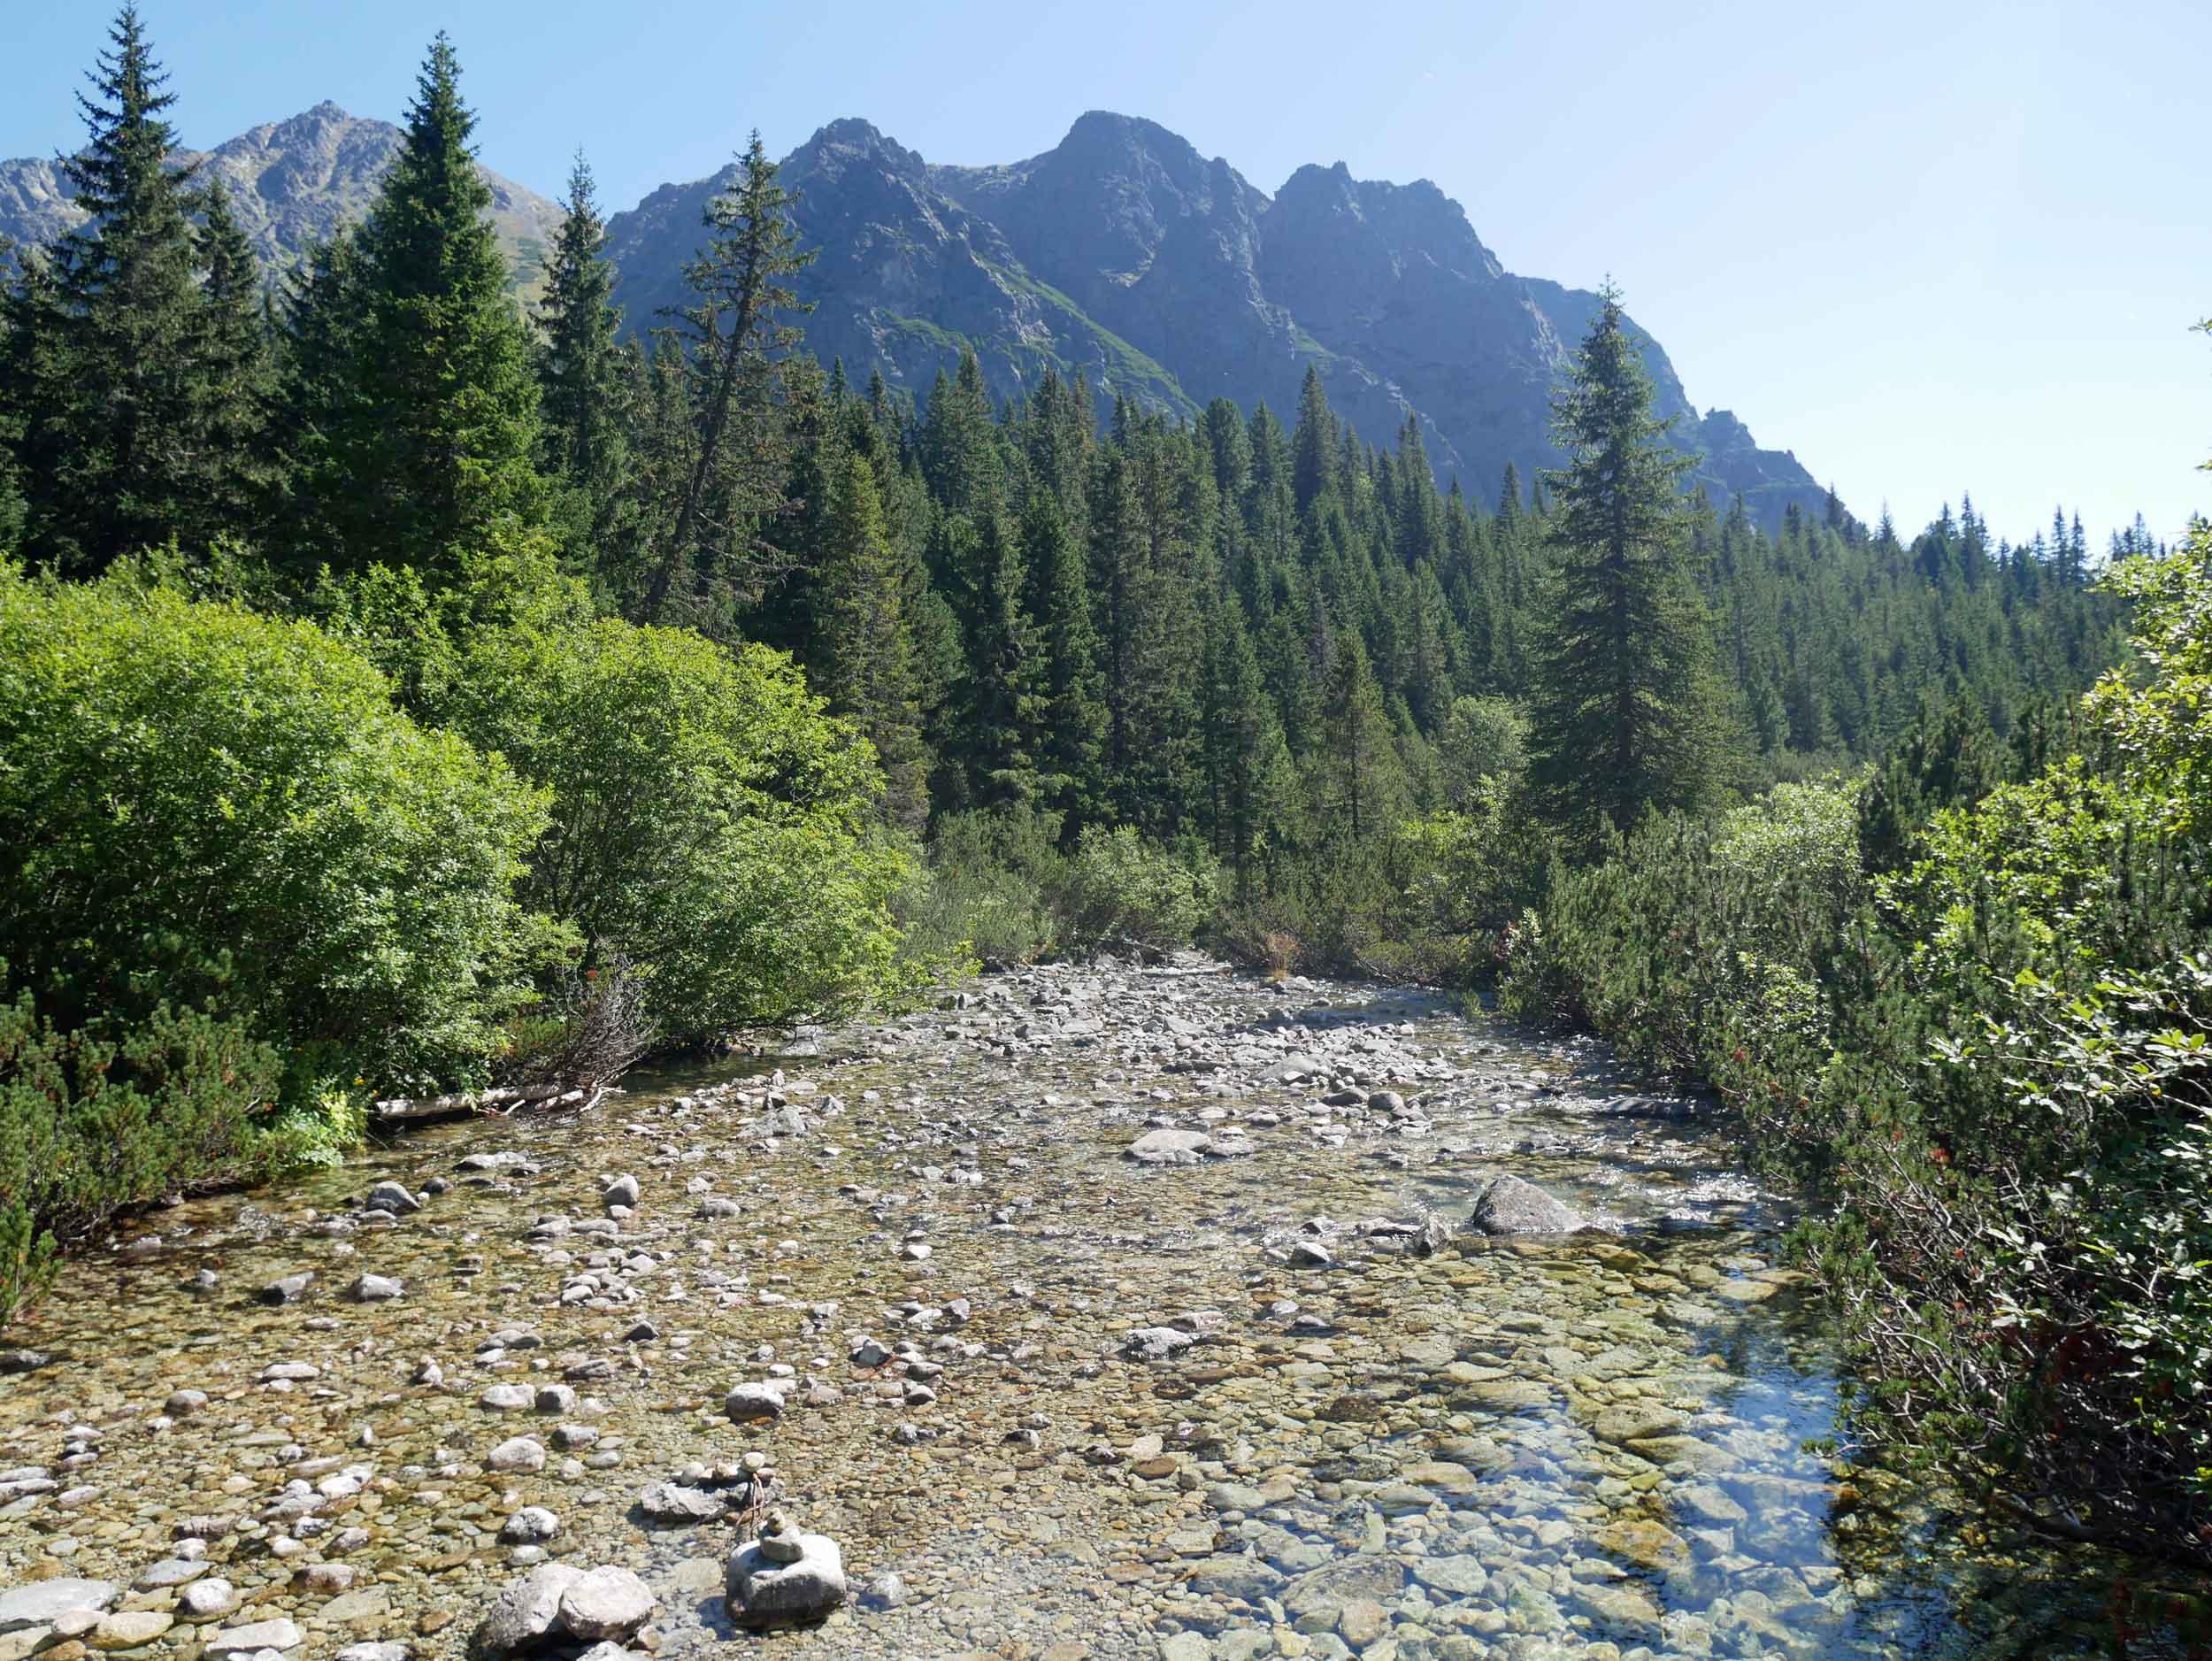 Resplendent waterways keep this region lush and green.